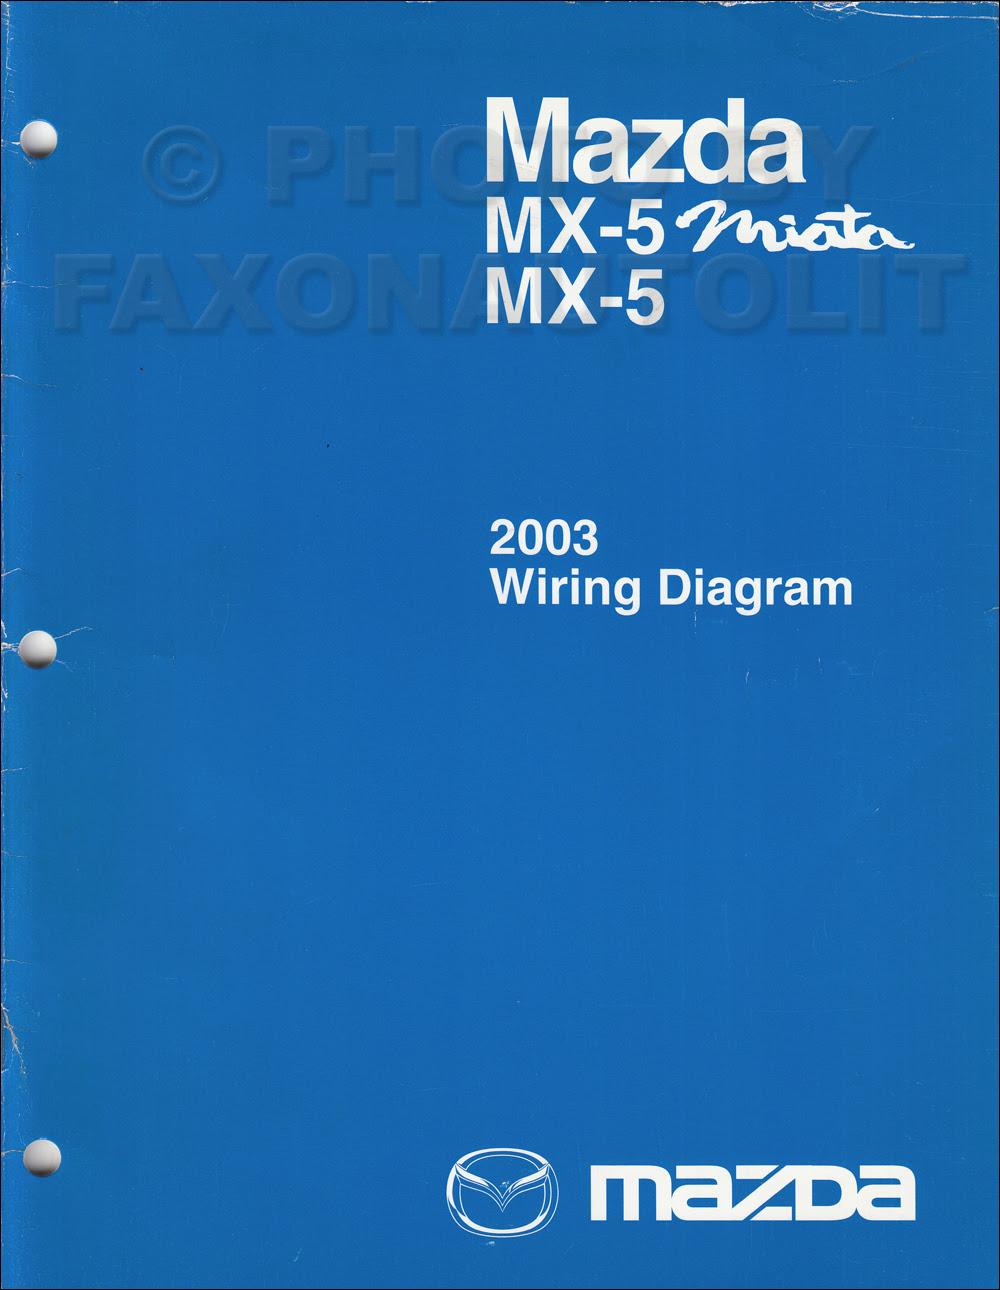 DIAGRAM 1997 Mazda Mx 5 Miata Wiring Diagram Original ...